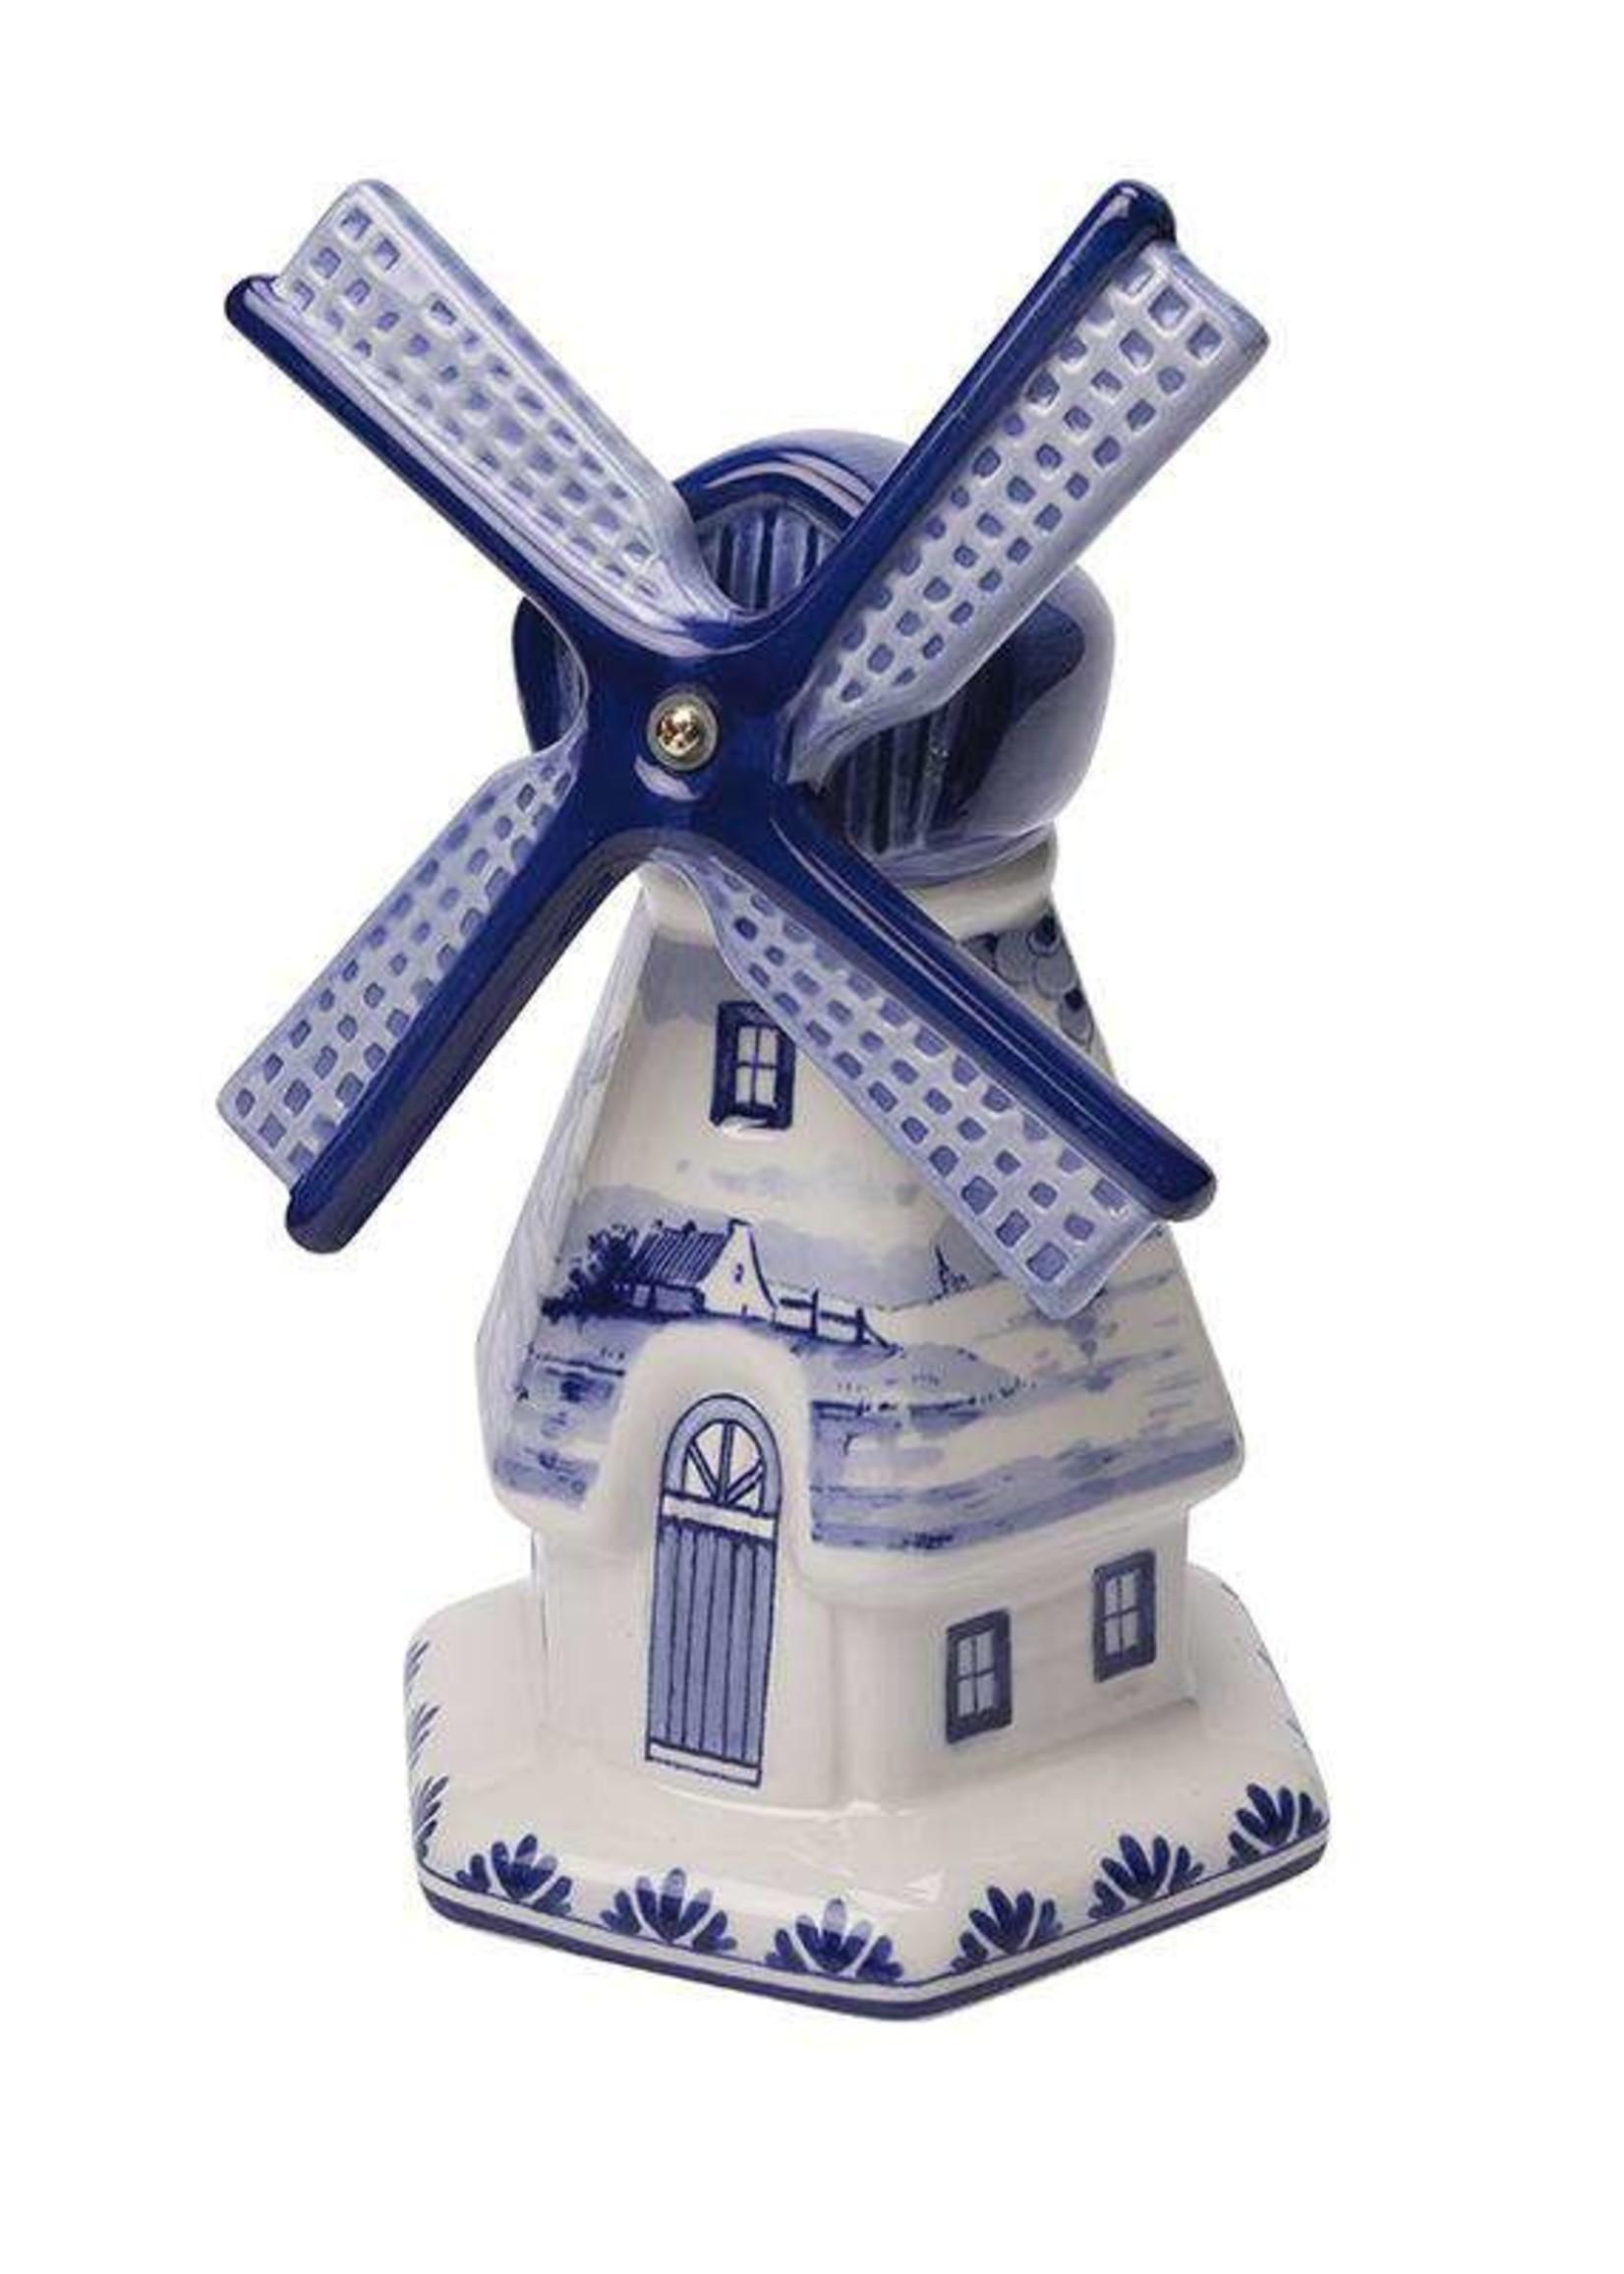 Heinen Delfts Blauw Delft Blue Windmill with a Dutch Landscape Drawing, Large